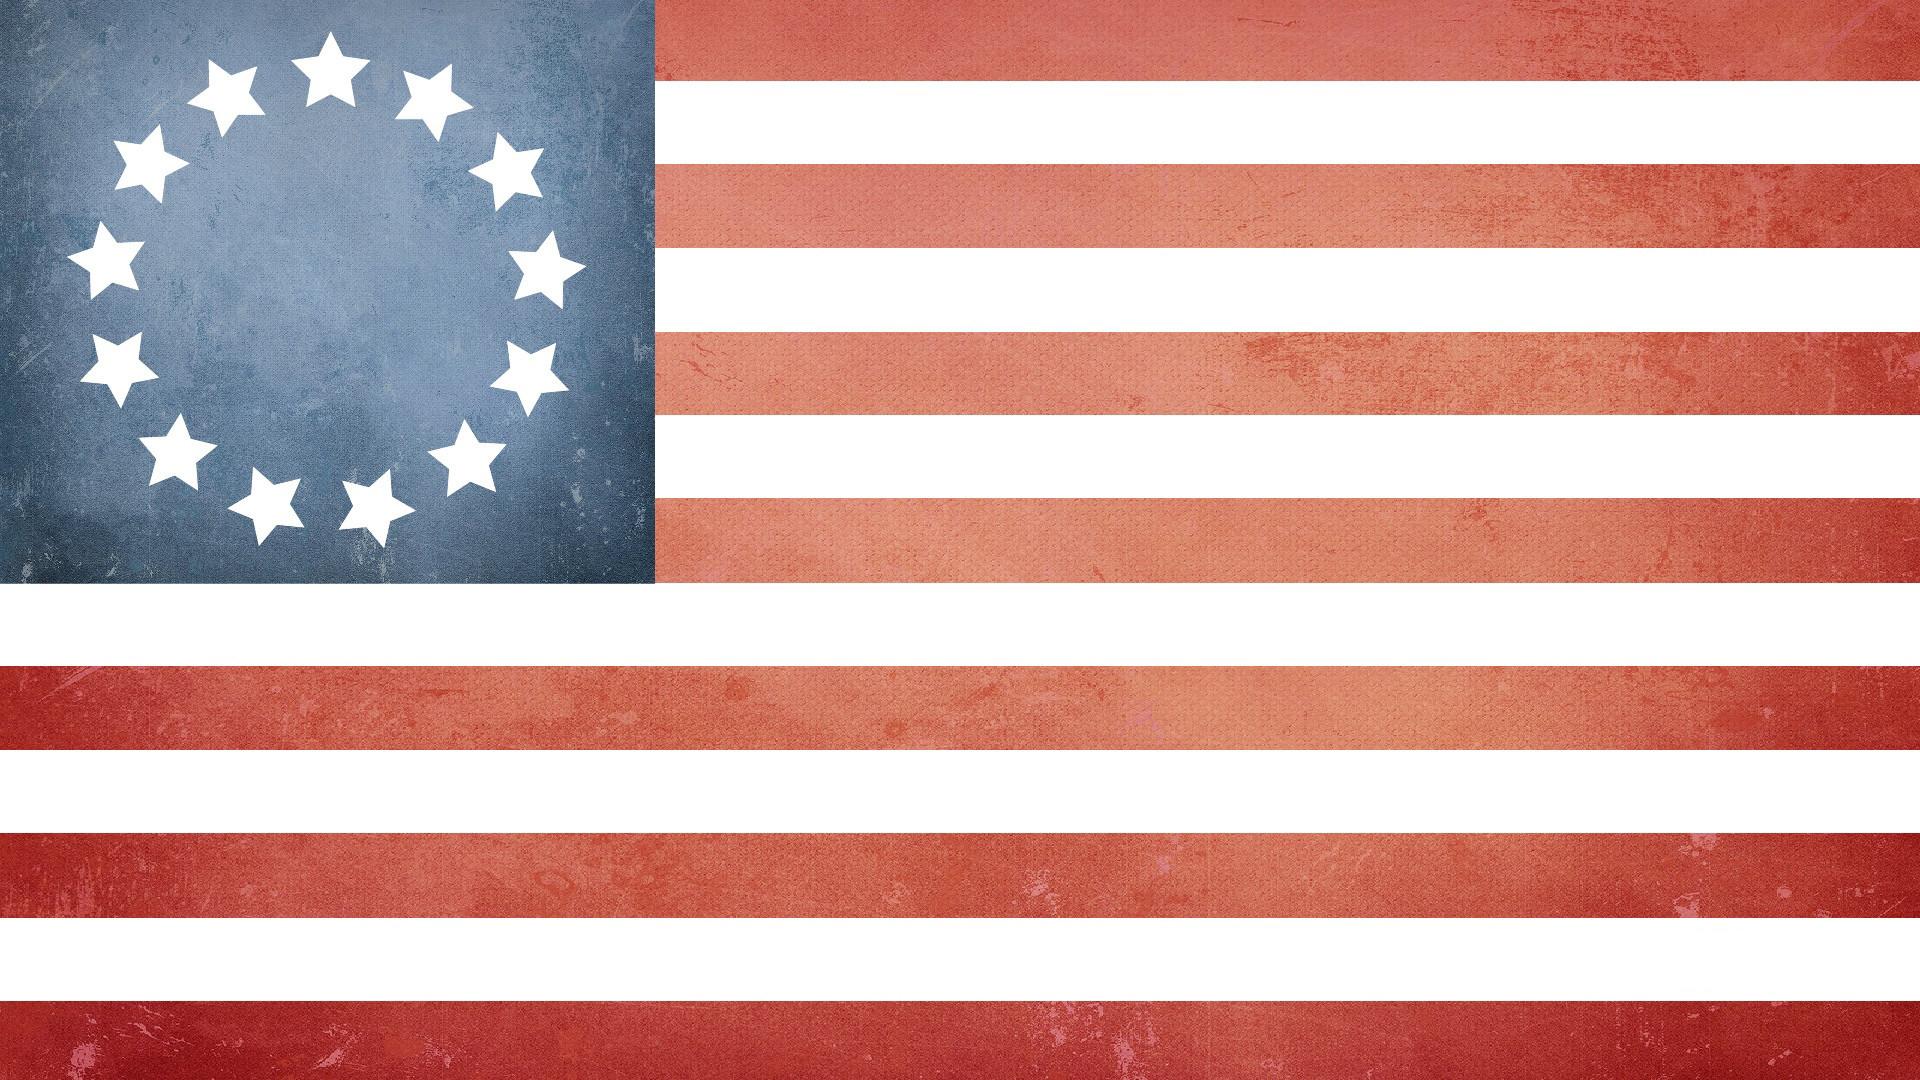 American Flag Wallpaper Paperbirchwine 915×515 American Flag Wallpaper (30  Wallpapers) | Adorable